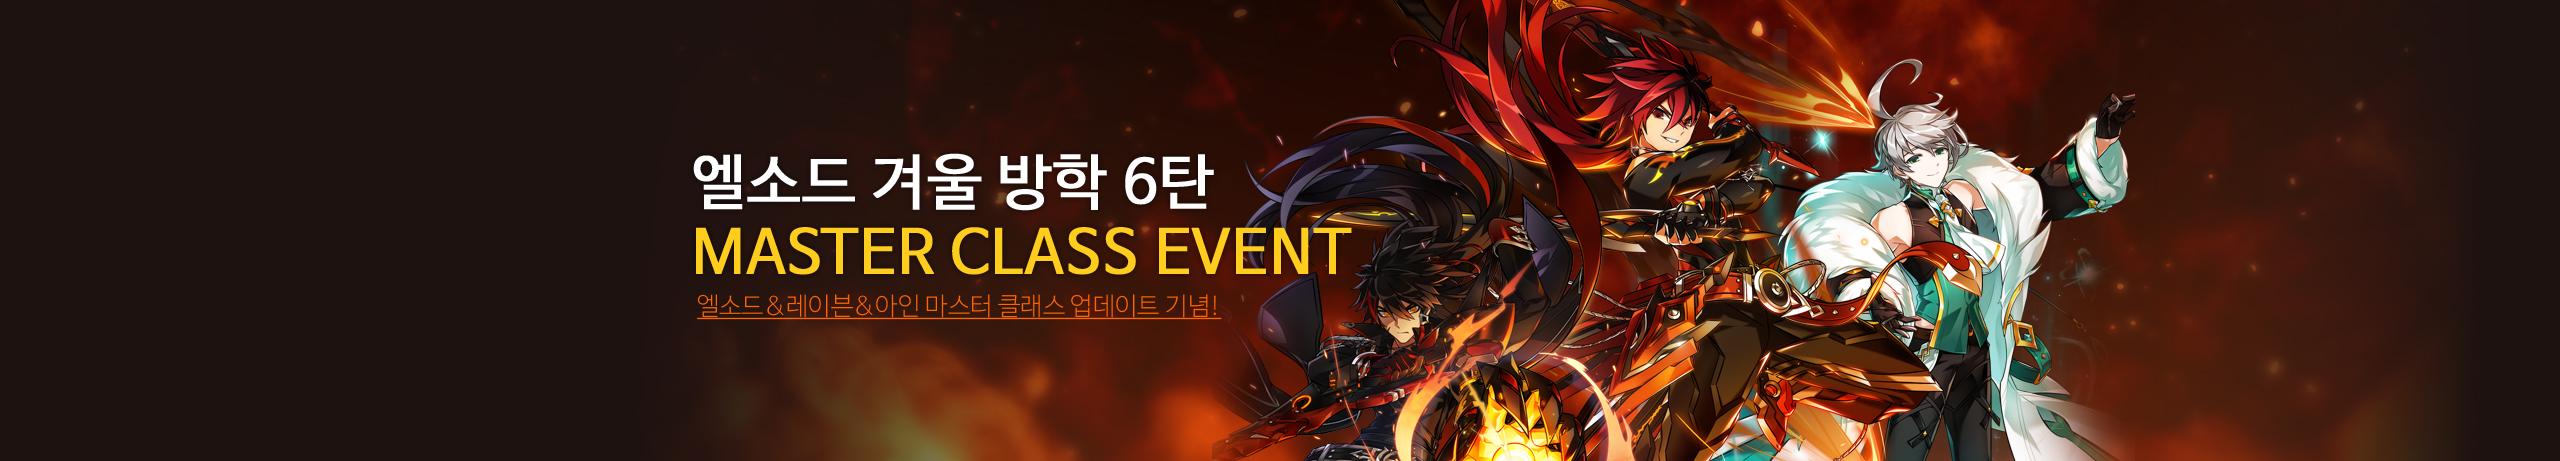 MASTER CLASS EVENT - 6차